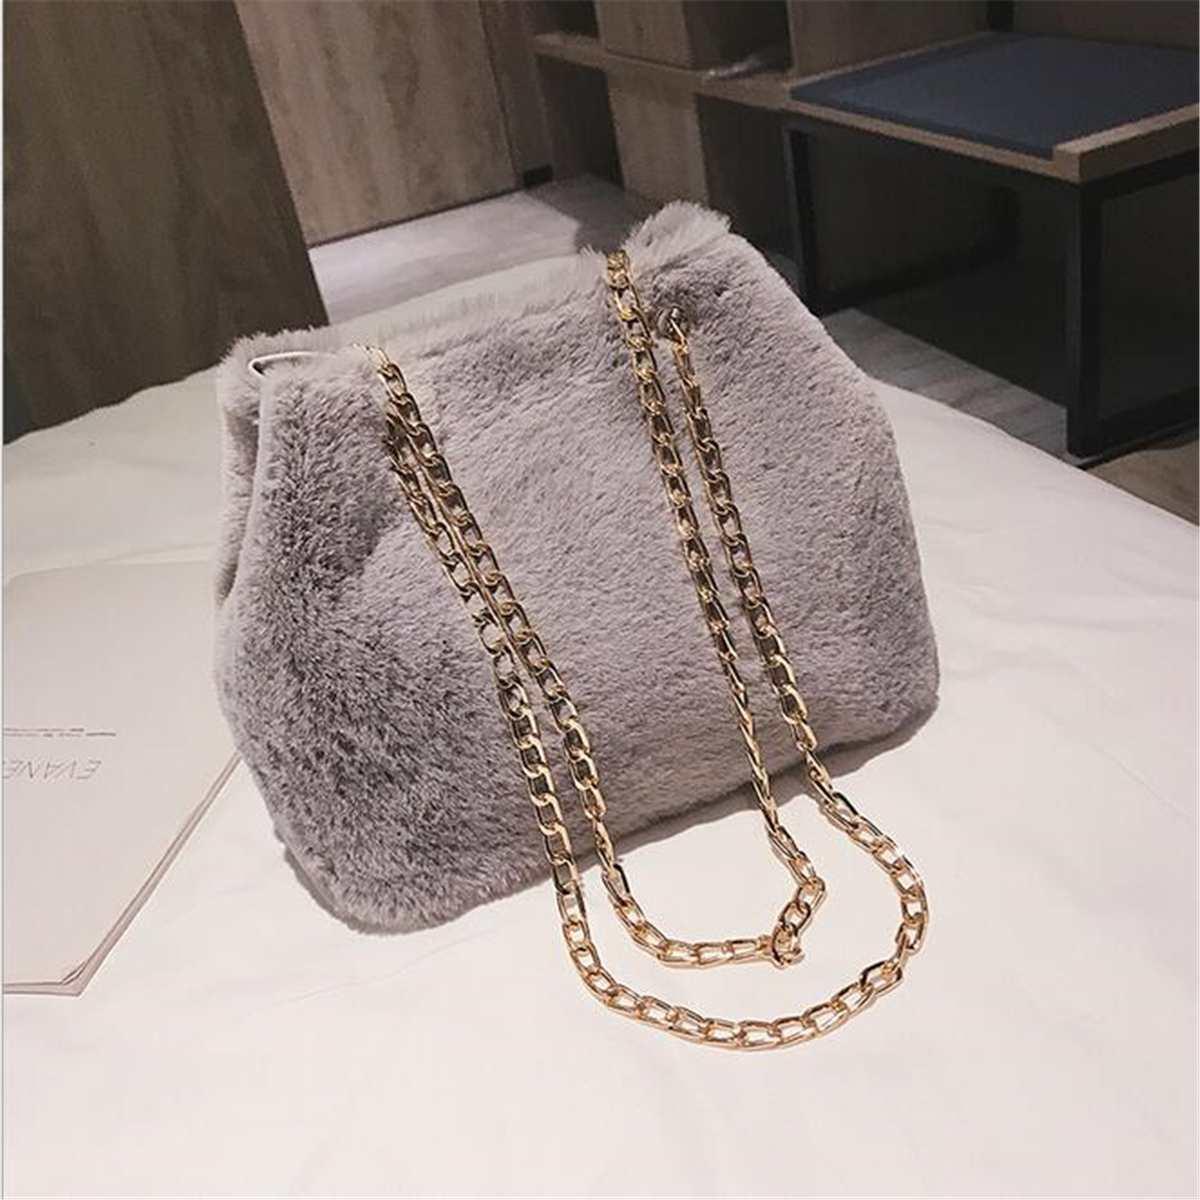 Osmond Feminine Bolsa Women Handbag Plush Chain Bag Fashion Faux Fur Messenger Bag Female Shoulder Crossbody Bag Ladies Tote 6